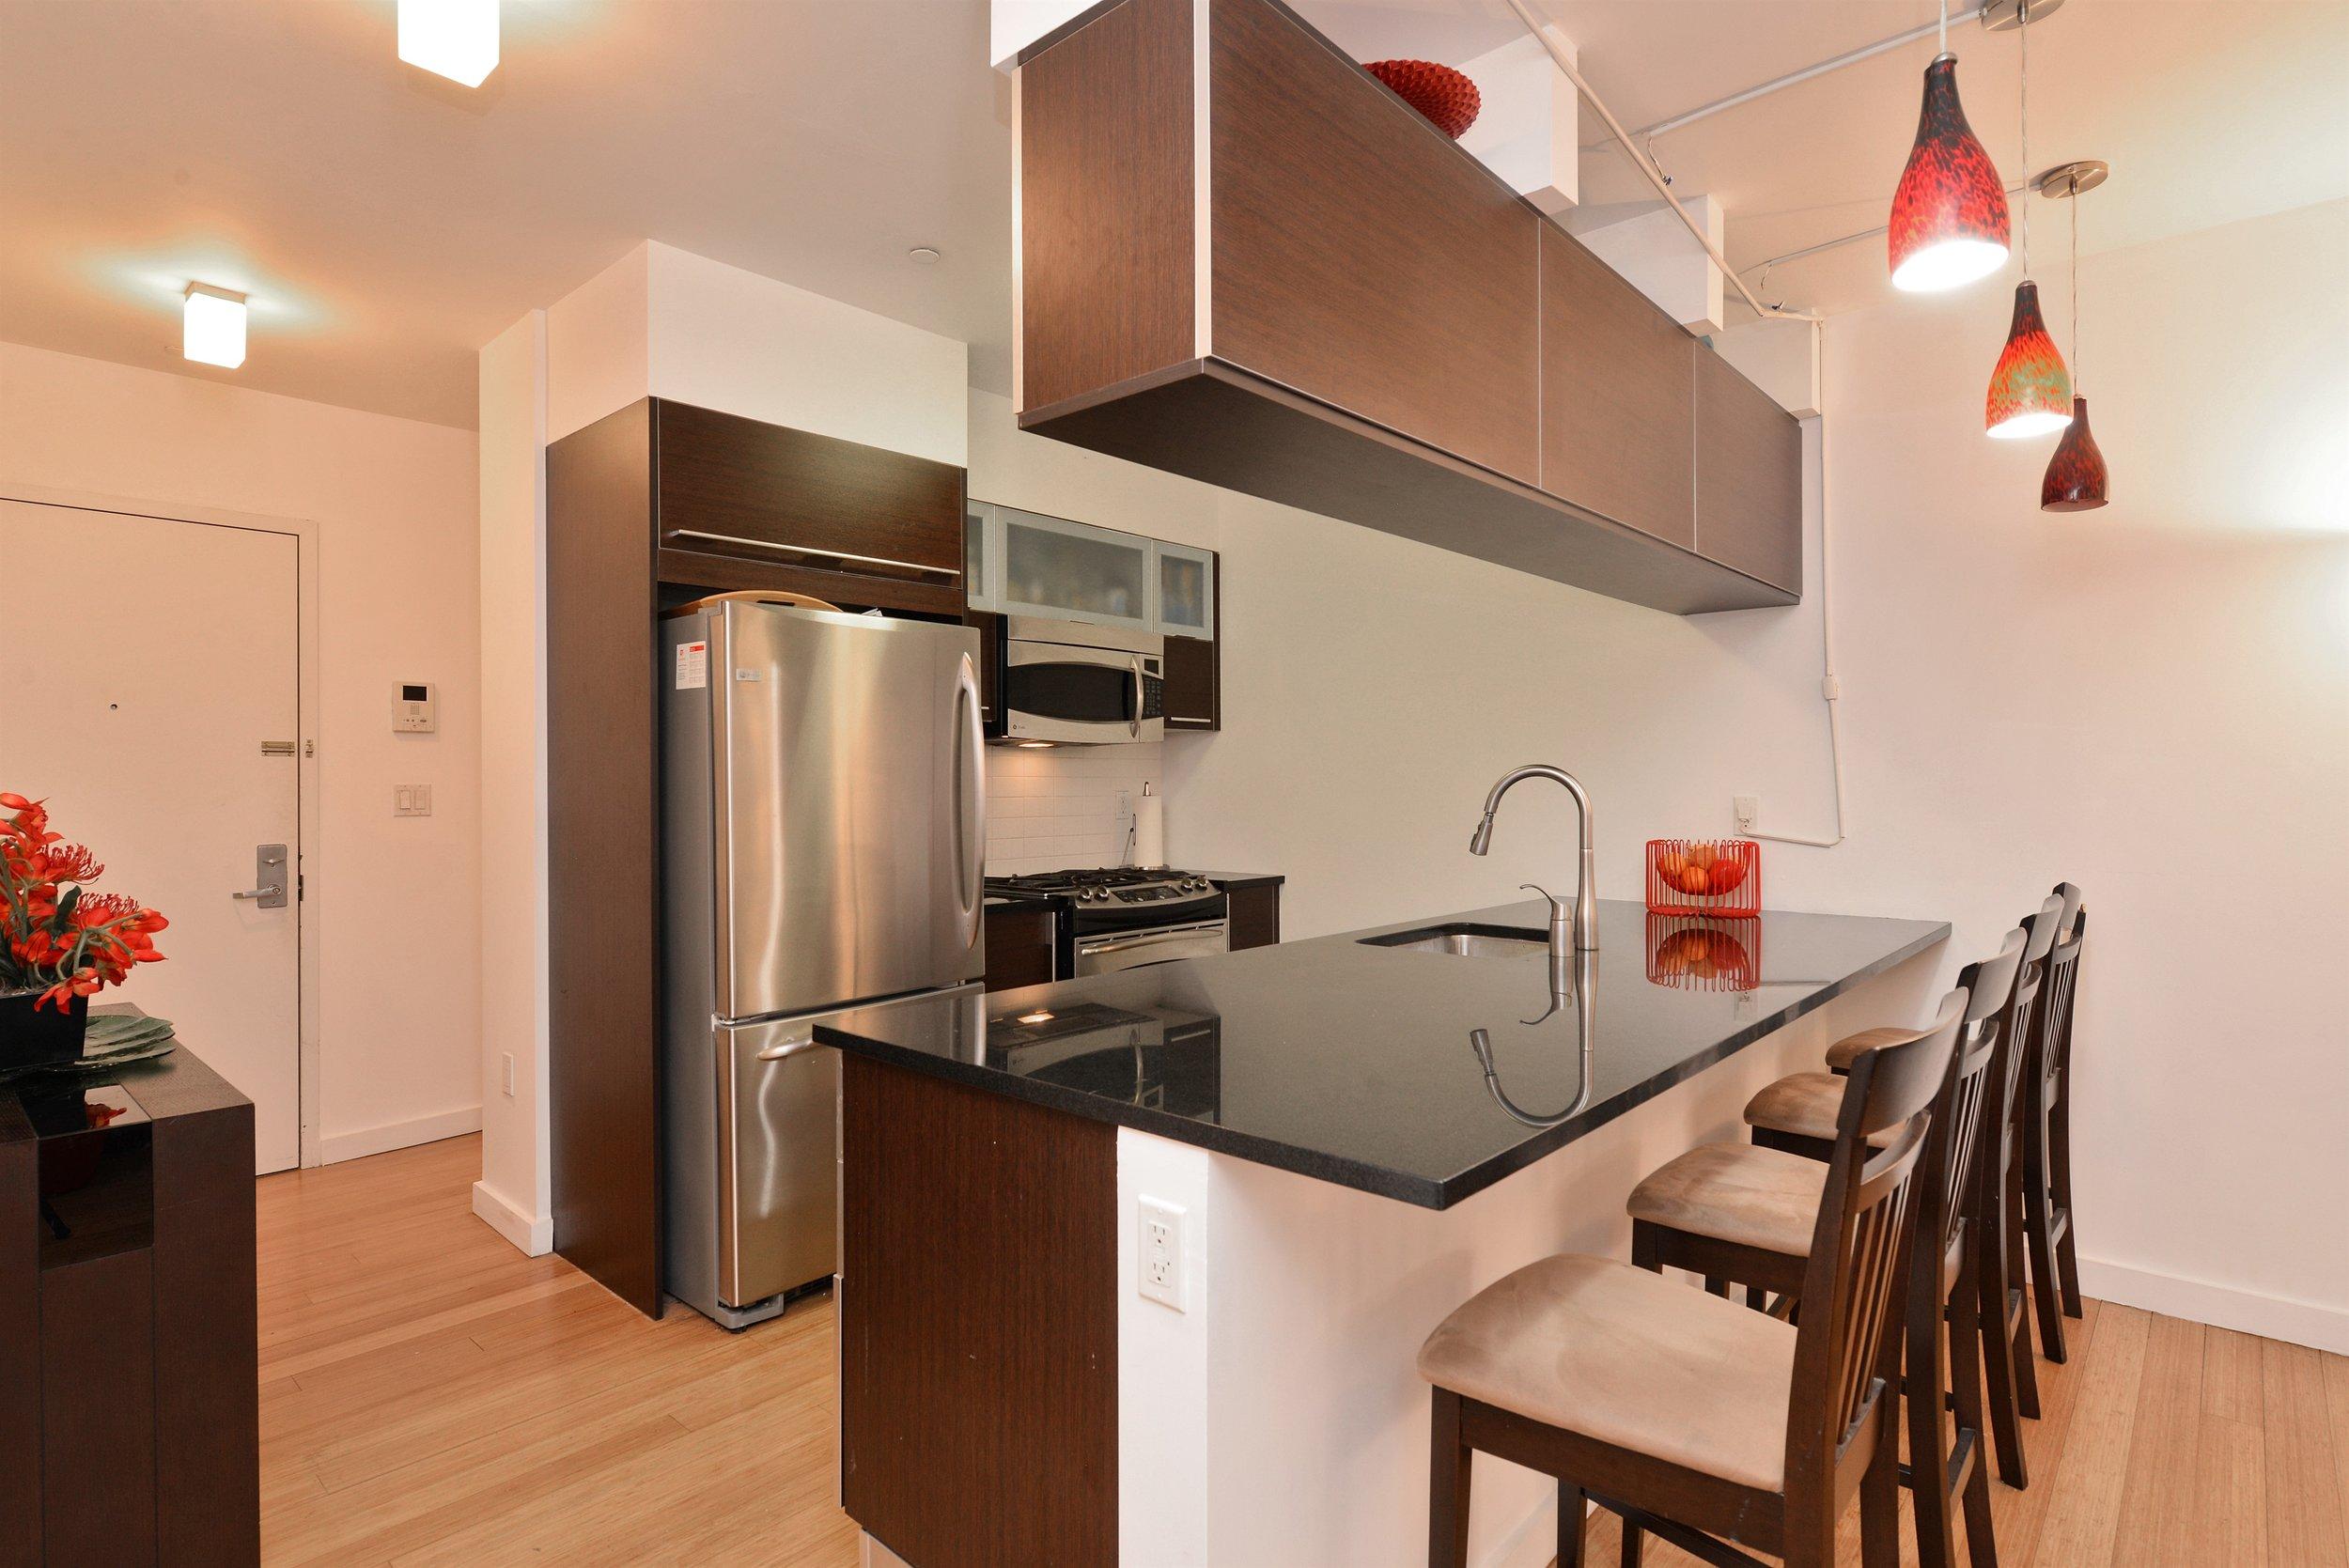 317 E 111 - Kitchen and Breakfast Area.jpg